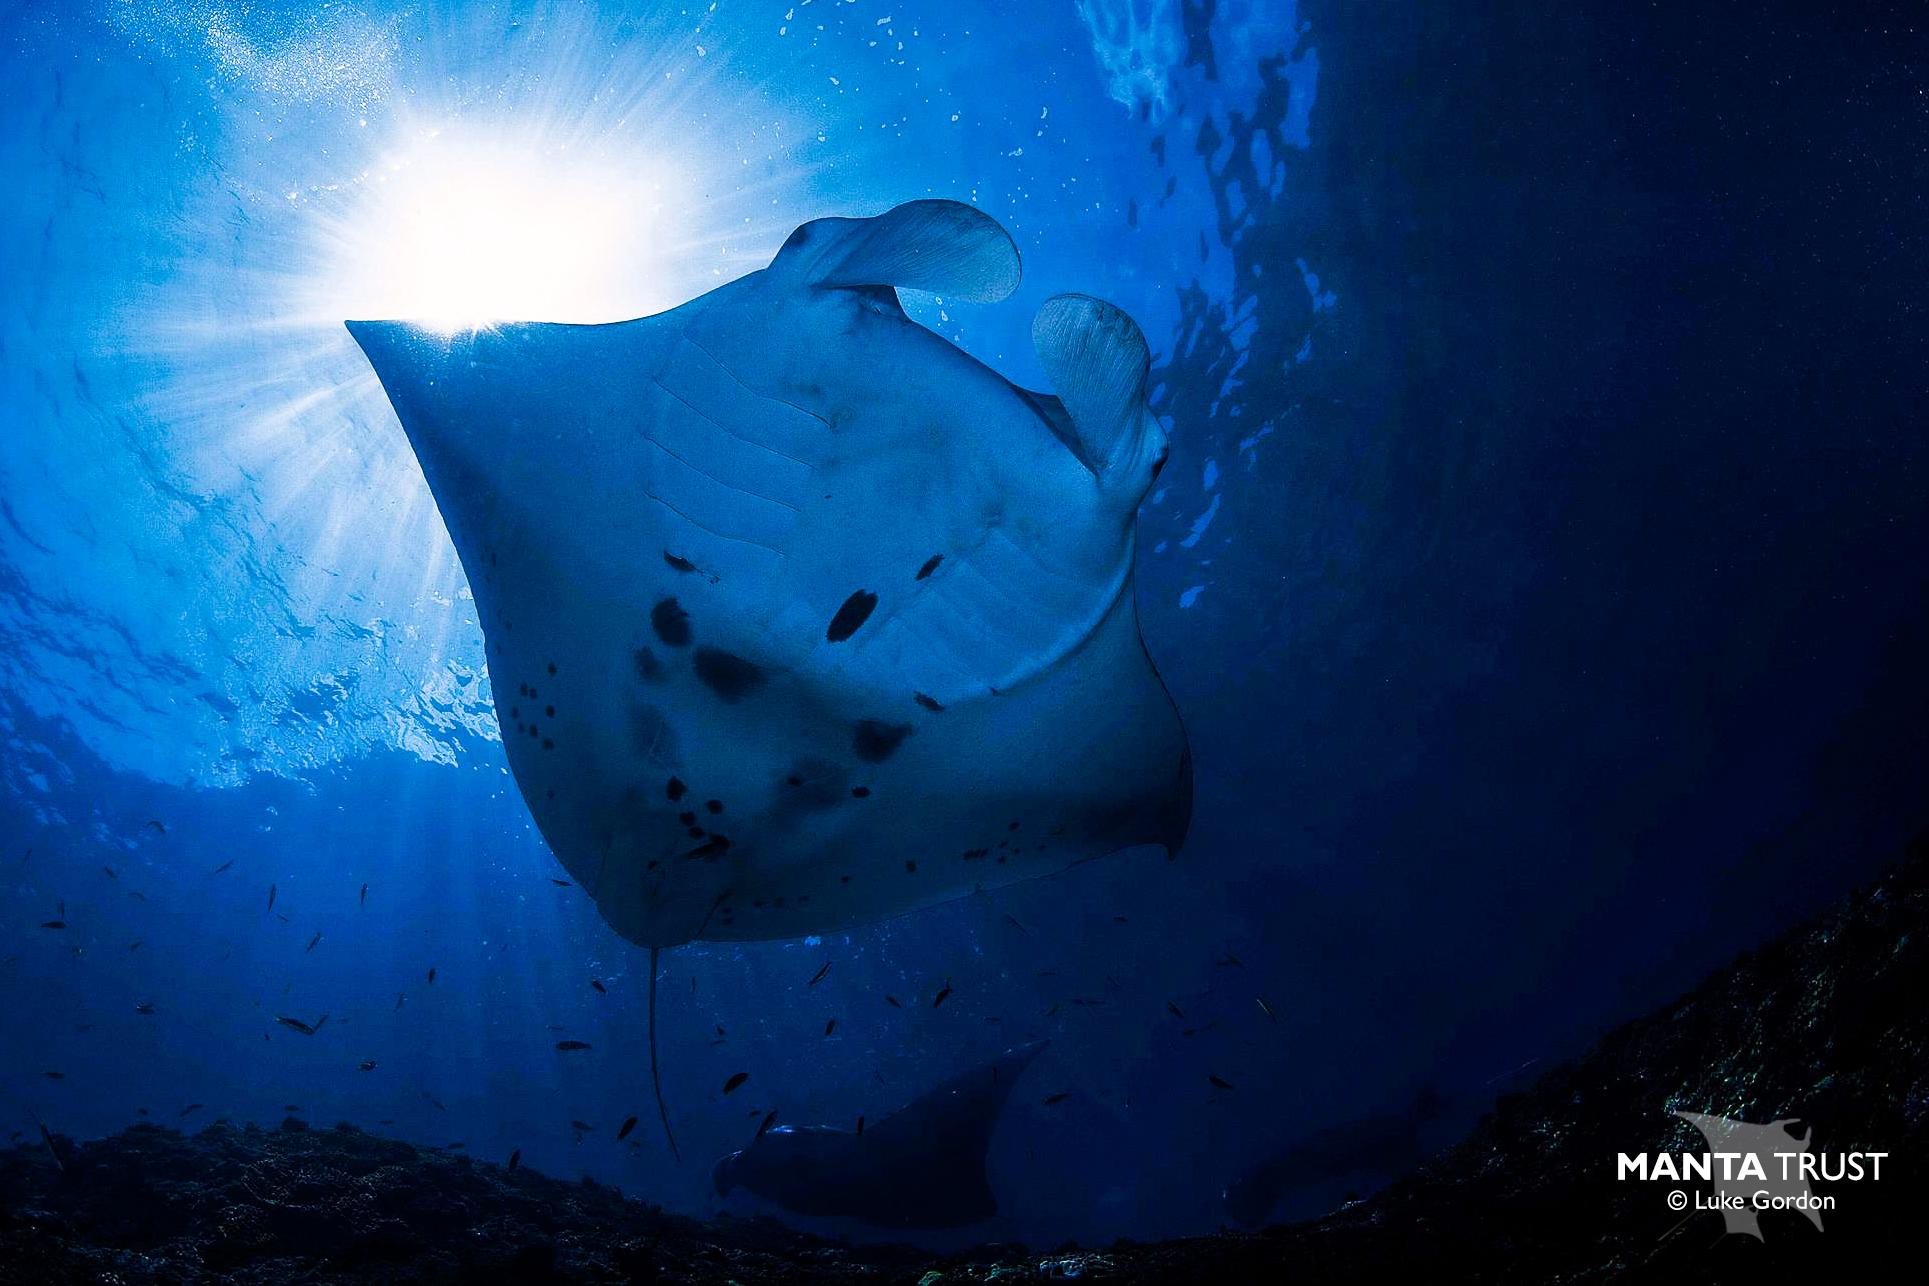 Fiji_manta ray_Luke Gordon_Chevron_watermarked.jpg